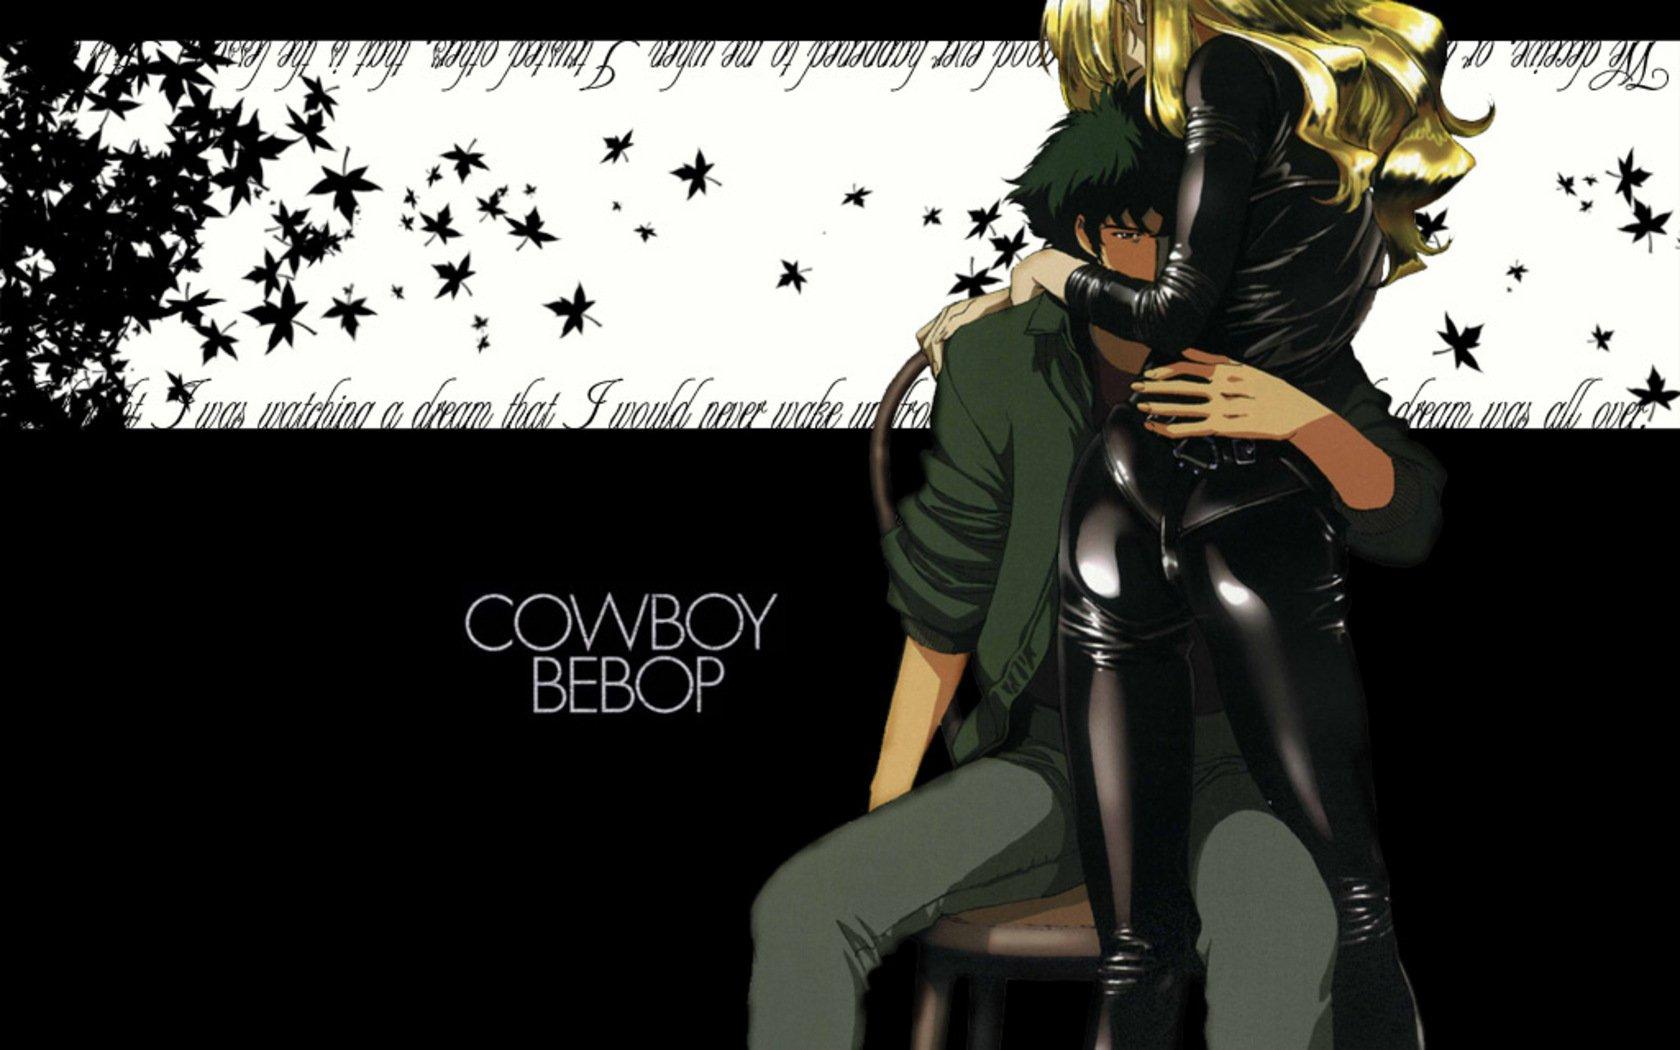 Cowboy Bebop Wallpaper and Background Image   1680x1050 ...